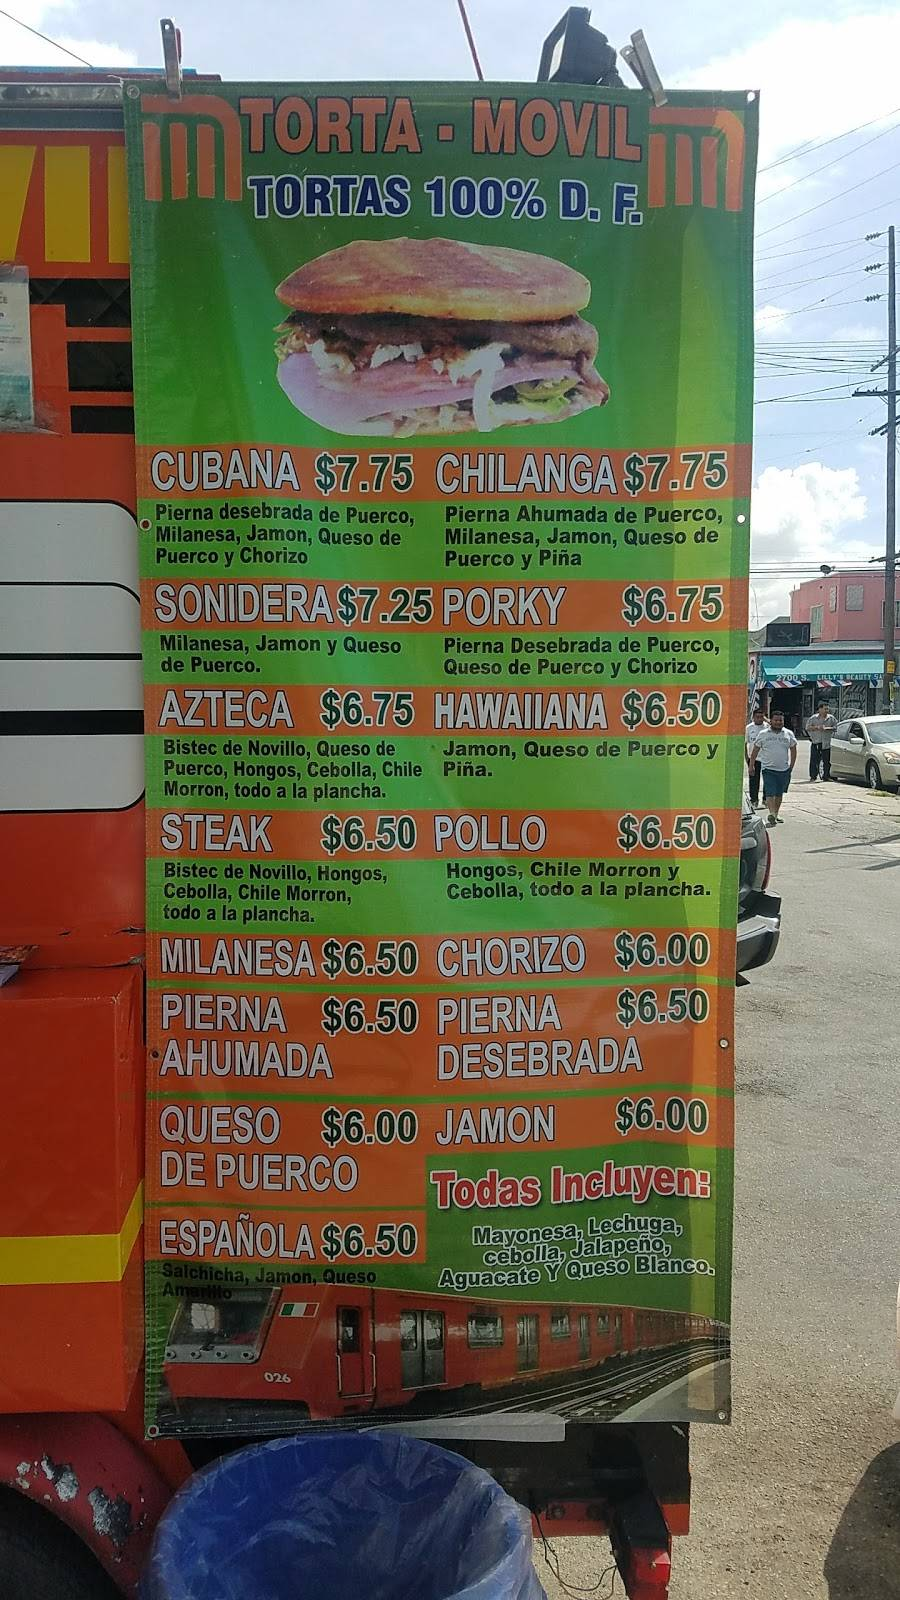 Torta Movil | restaurant | 2623 San Pedro St, Los Angeles, CA 90011, USA | 3235733968 OR +1 323-573-3968